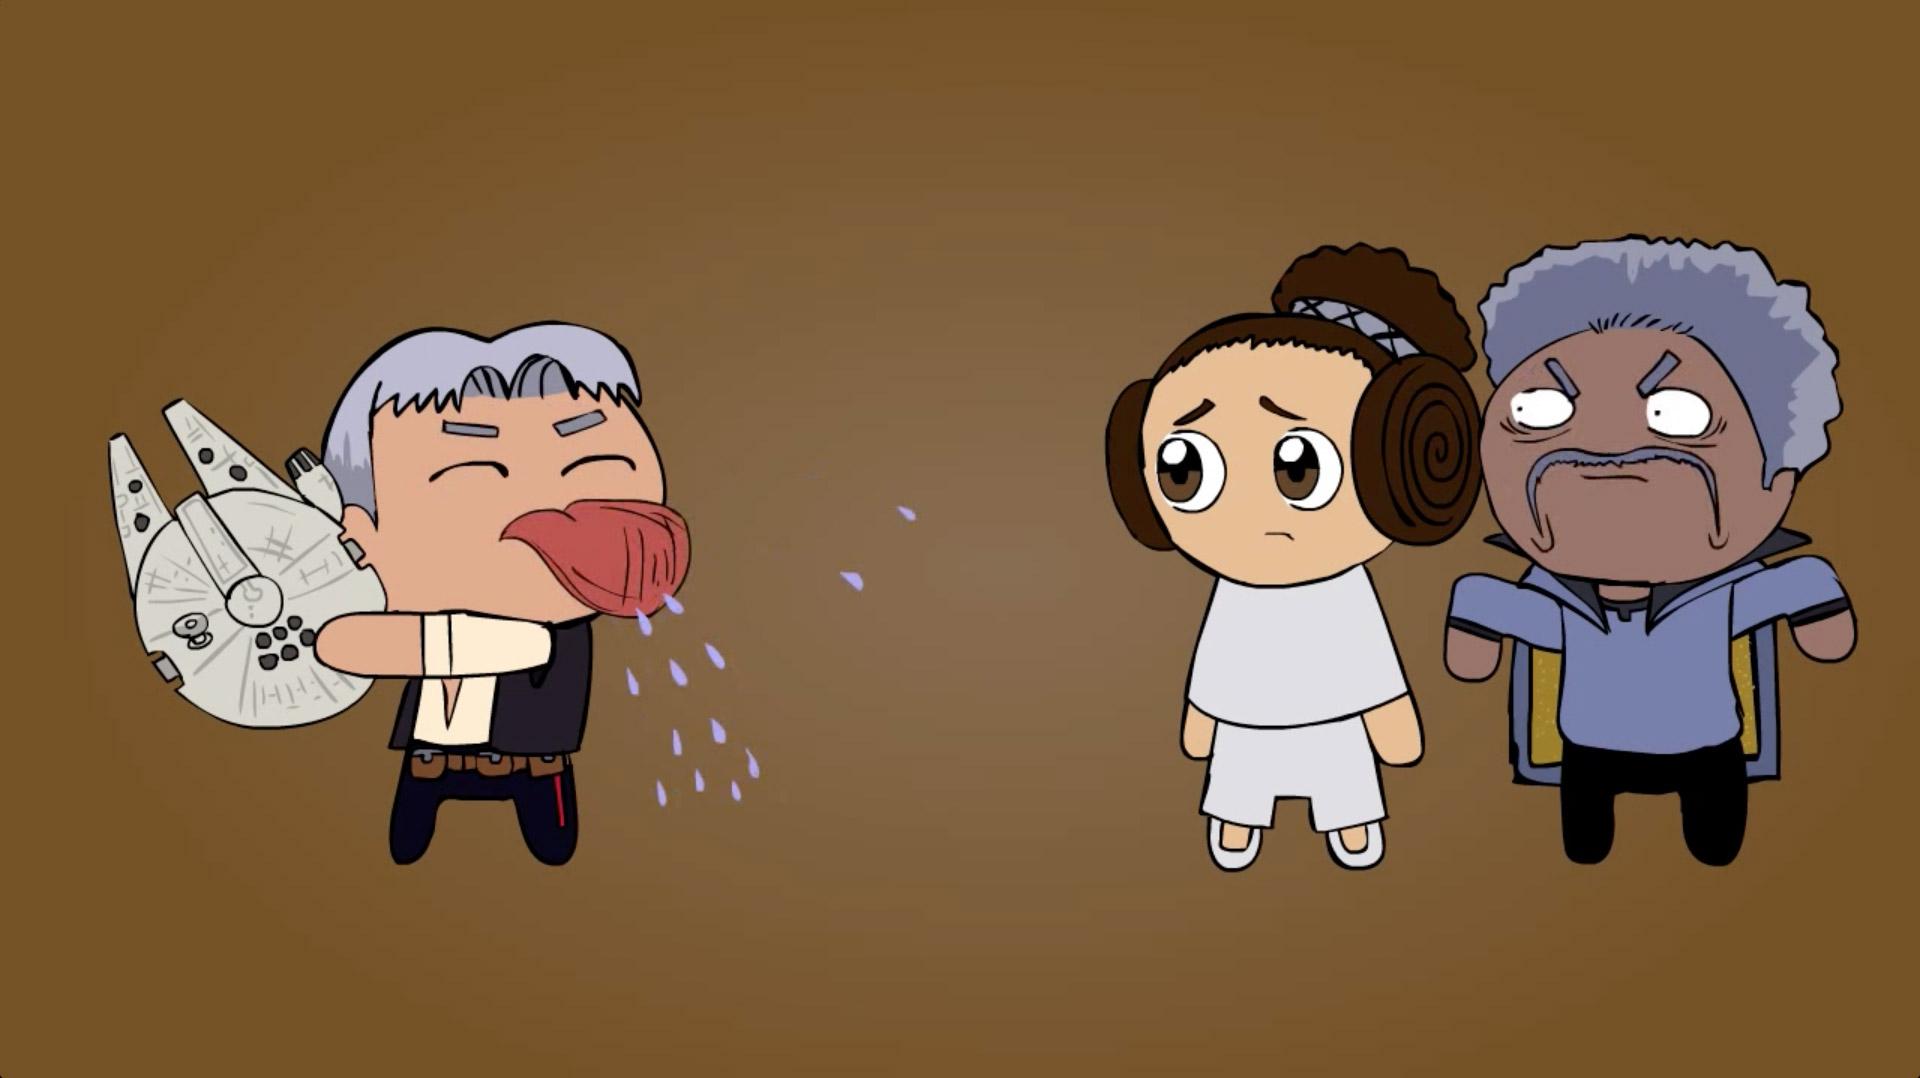 patton-oswalts-star-wars-fillbuster-gets-animated-22.jpg